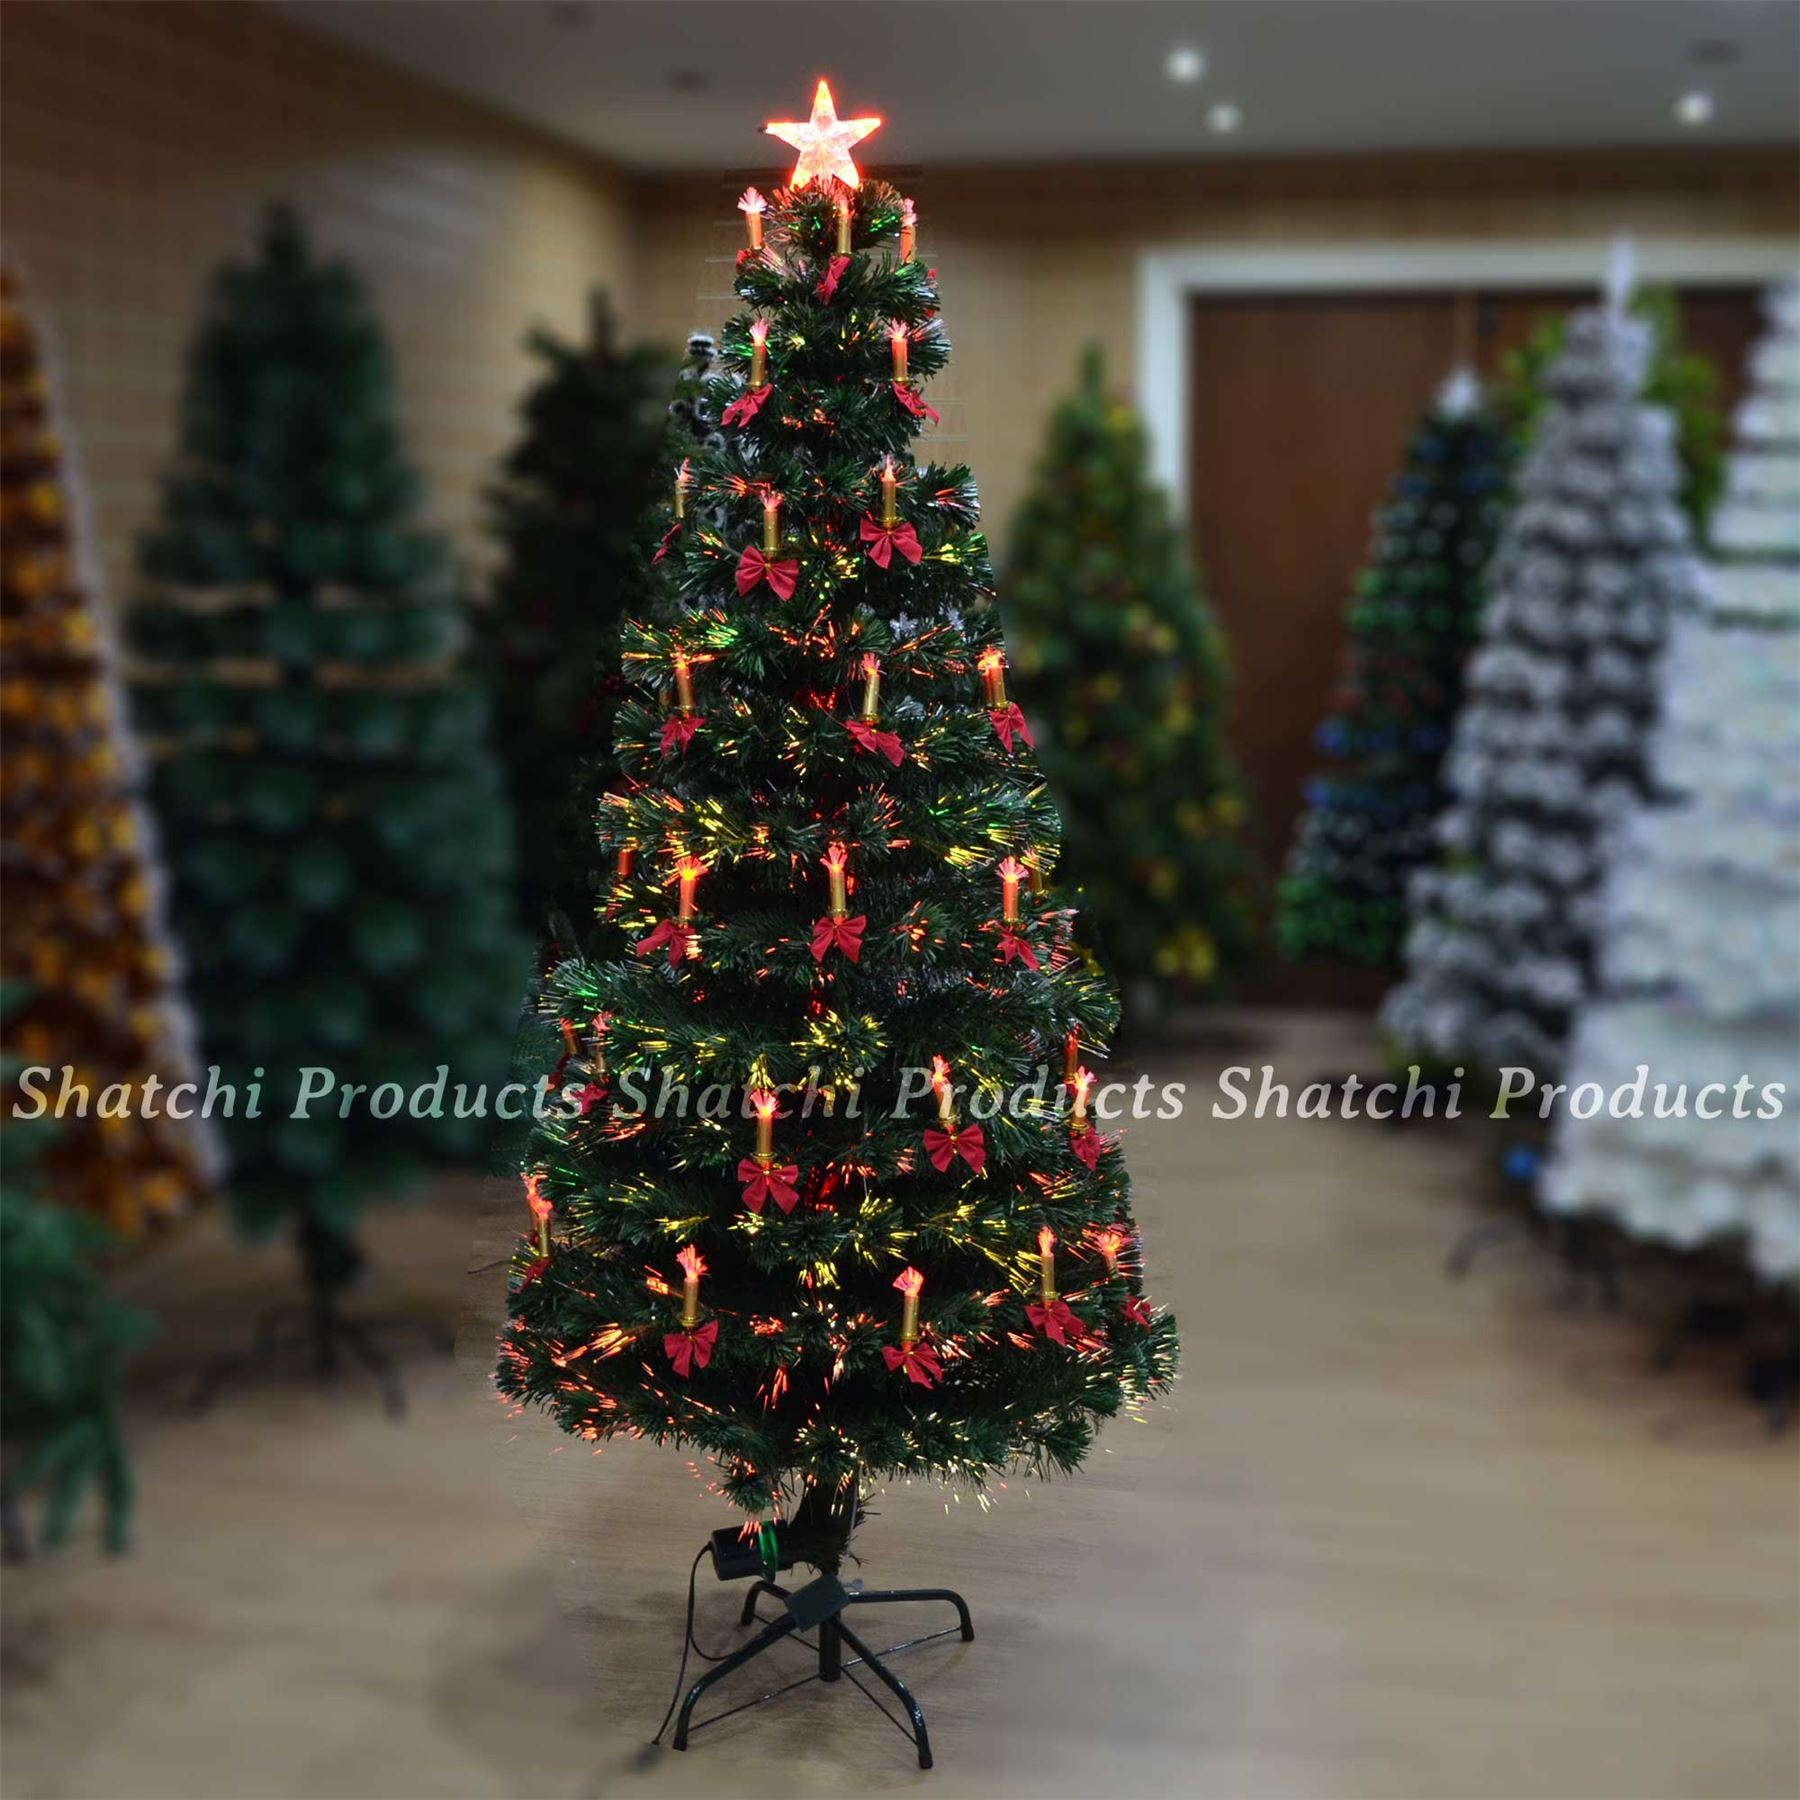 Led Fiber Optic Christmas Trees.3ft Led Fibre Optic Christmas Tree Pre Lit Xmas Decoration With Candle Bow Walmart Com